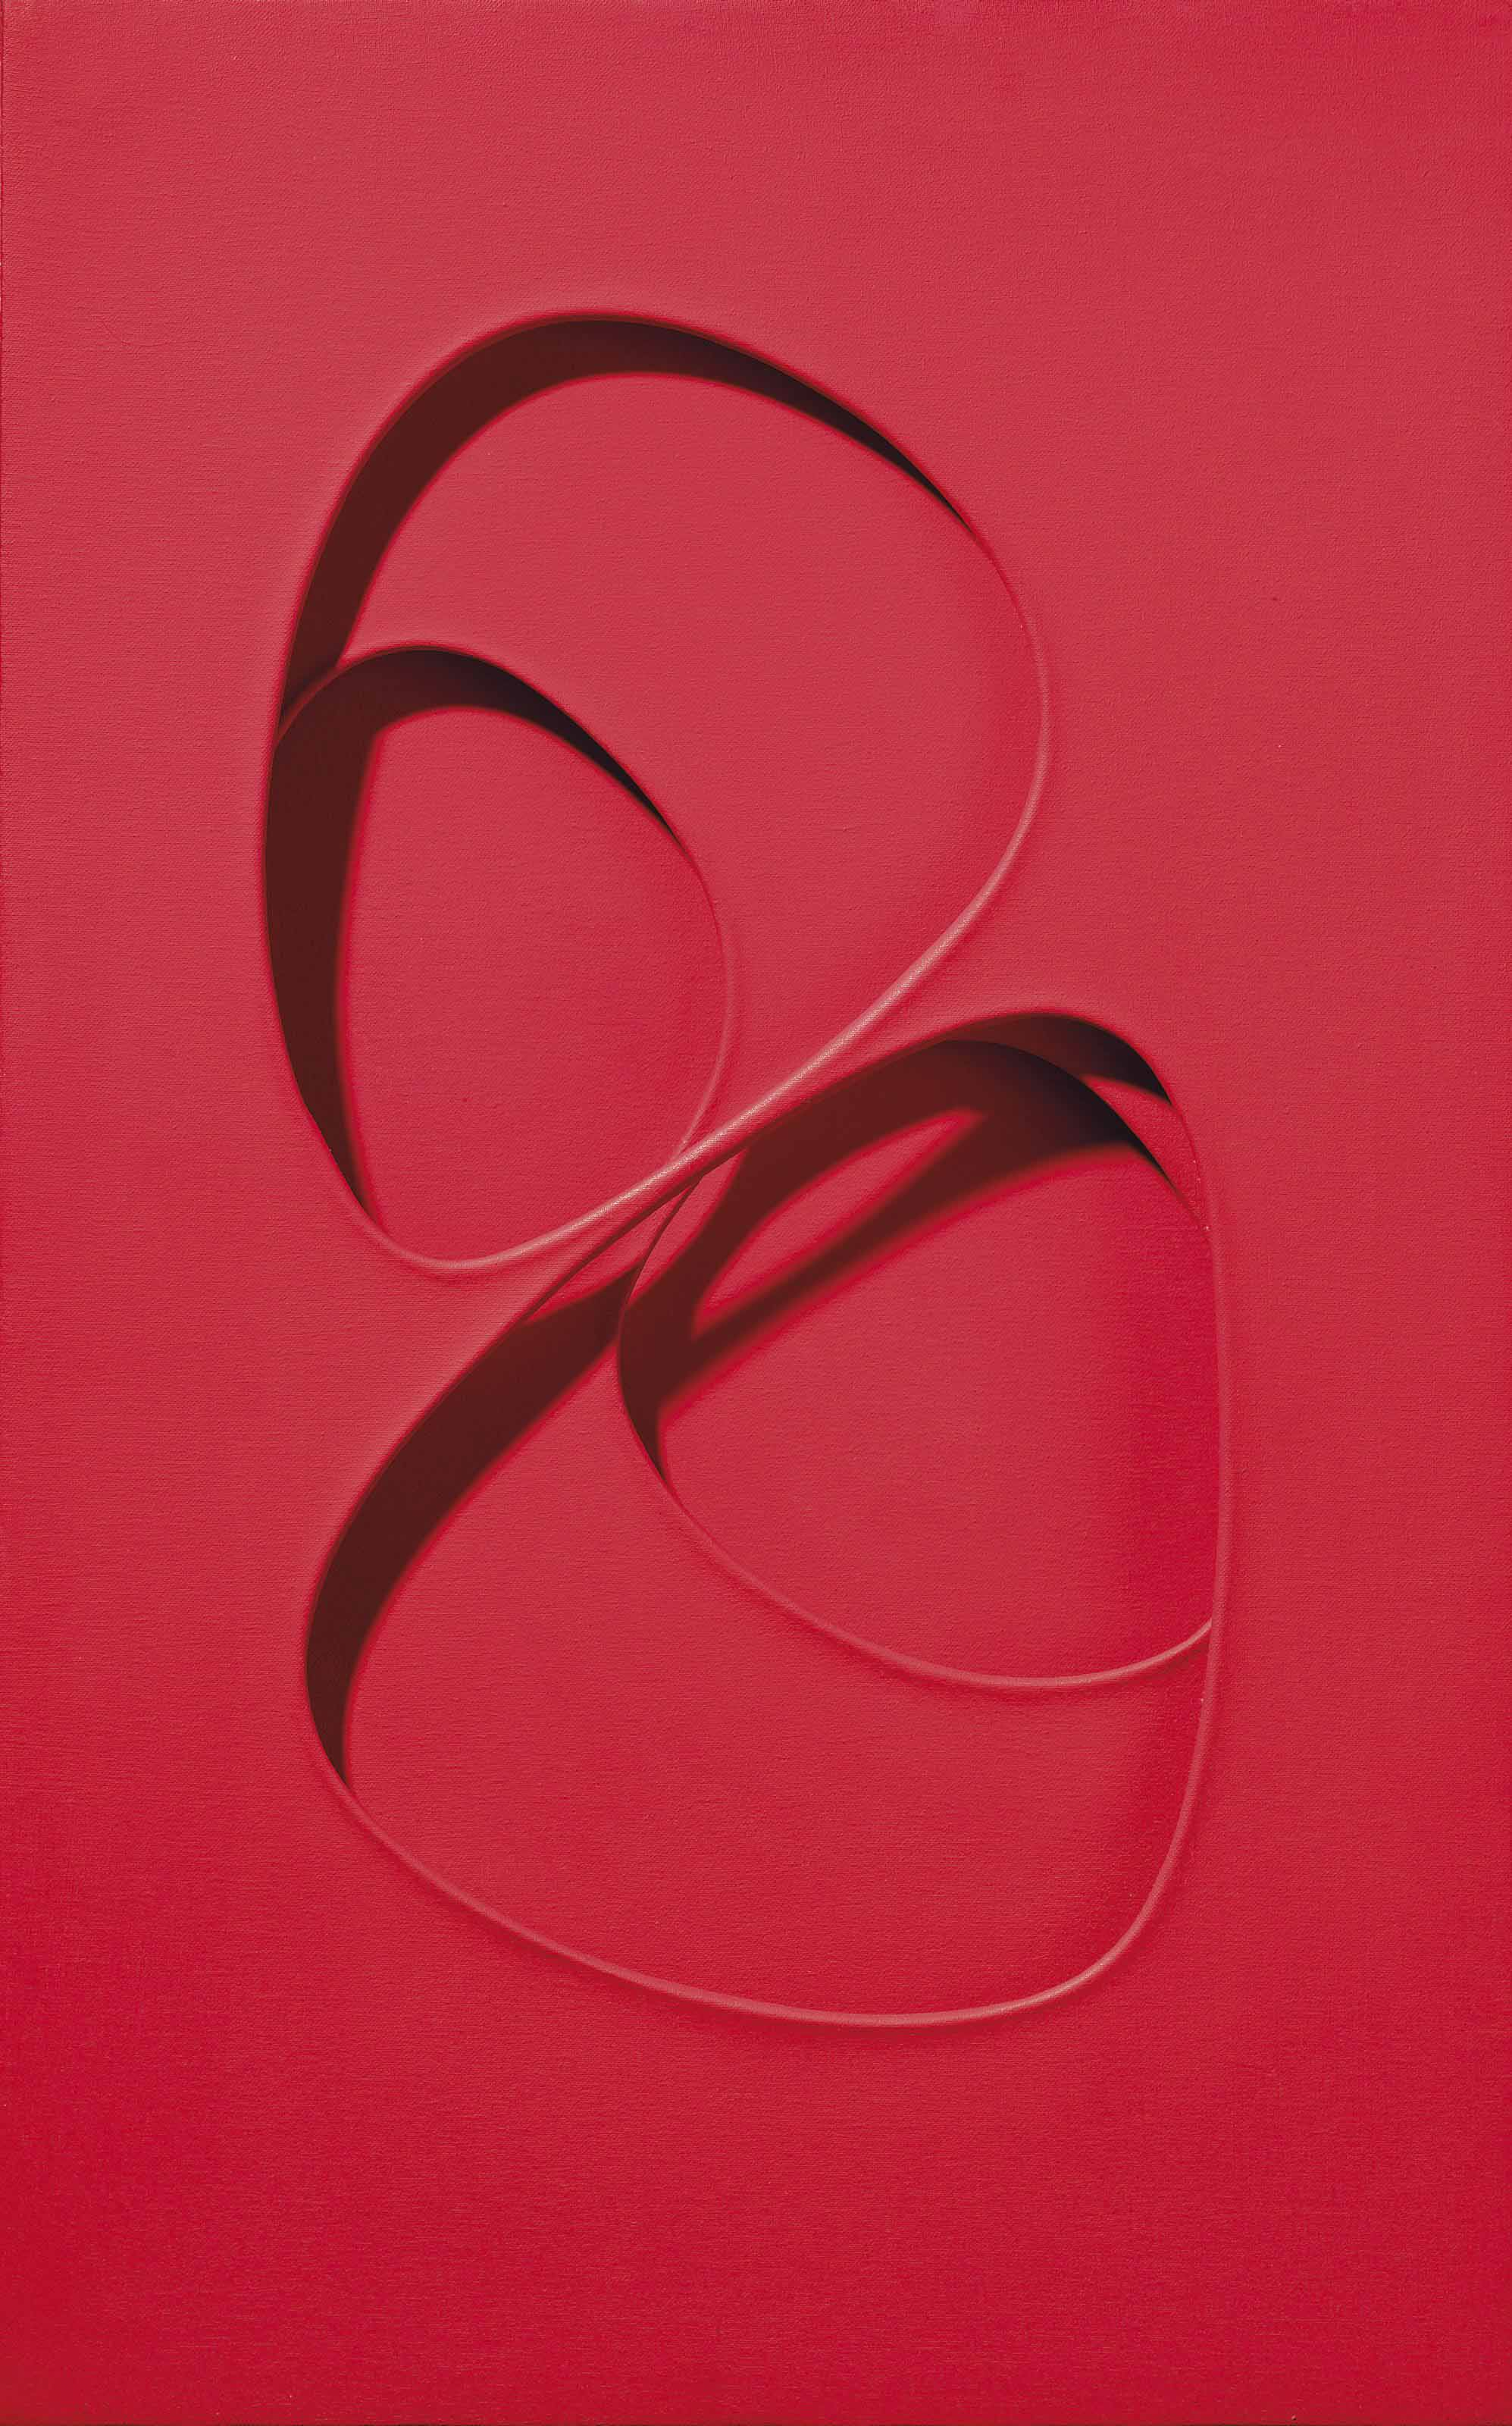 Intersuperficie curva dal rosso